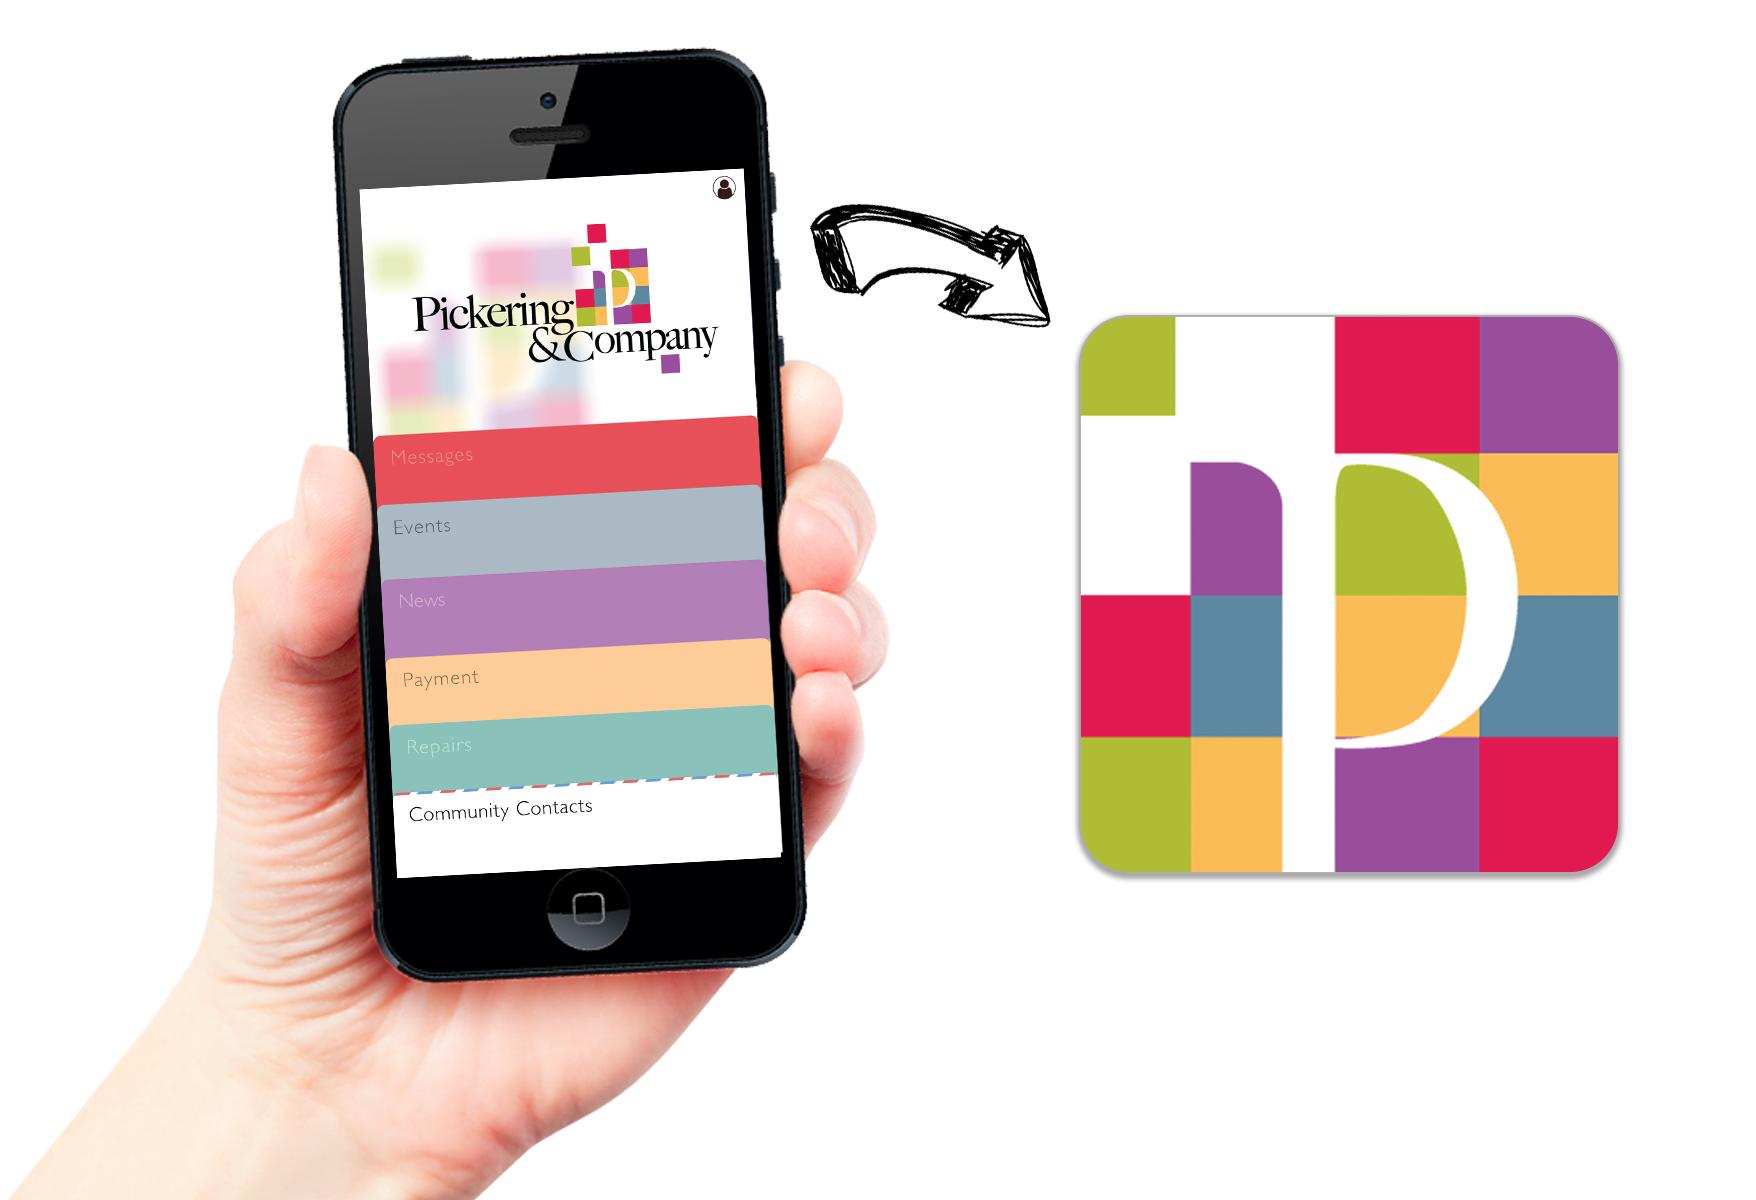 Pickering and Company App